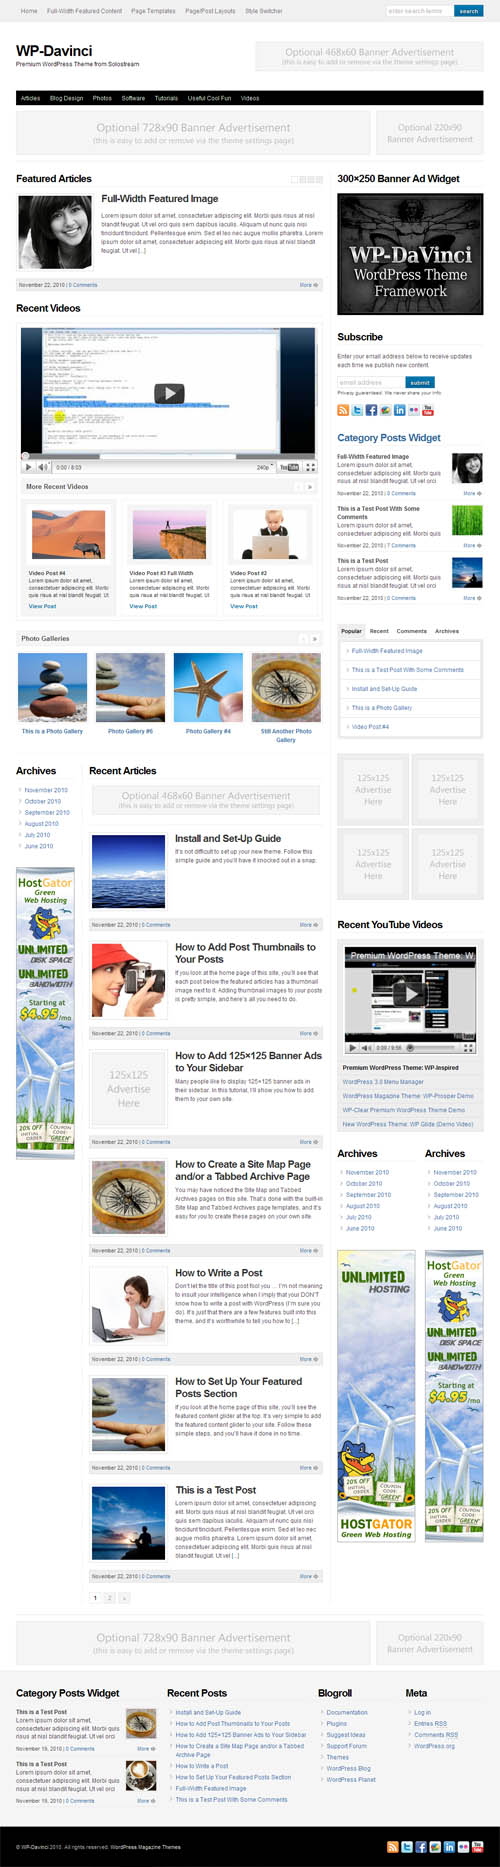 wp-davinci-magazine-wordpress-theme